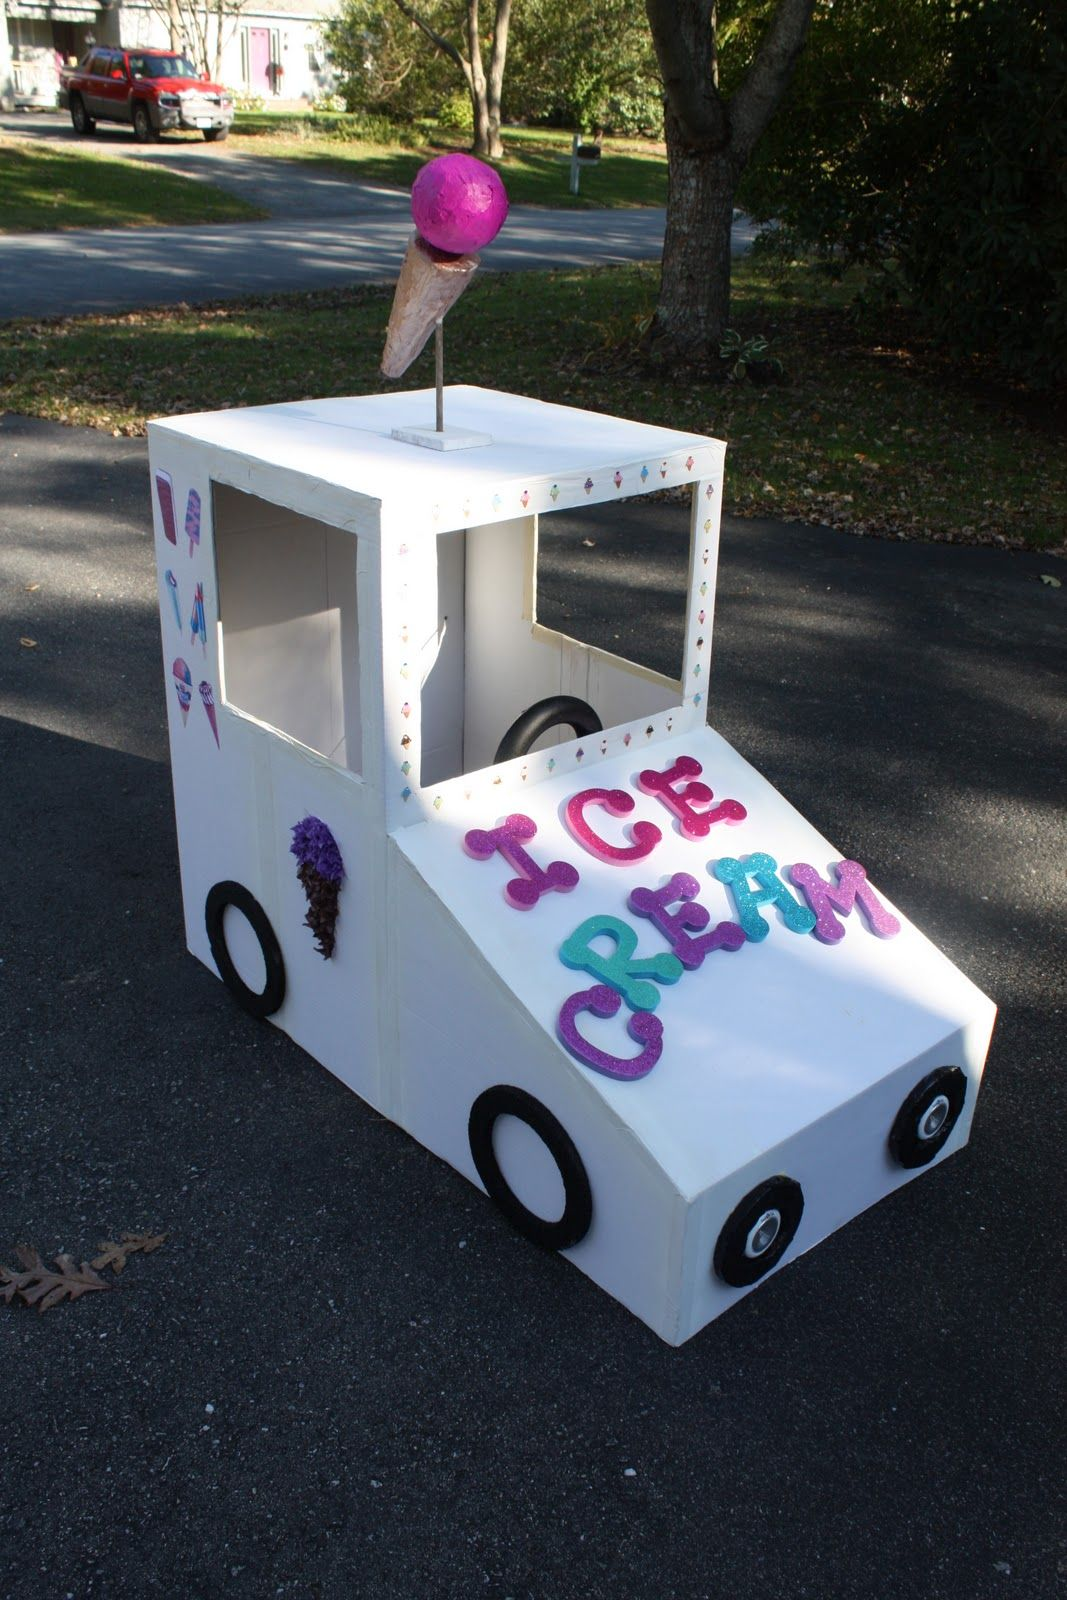 Diy Ice Cream Truck : cream, truck, Tableof4please.com, Kids,, Daycare, Crafts,, Cream, Truck